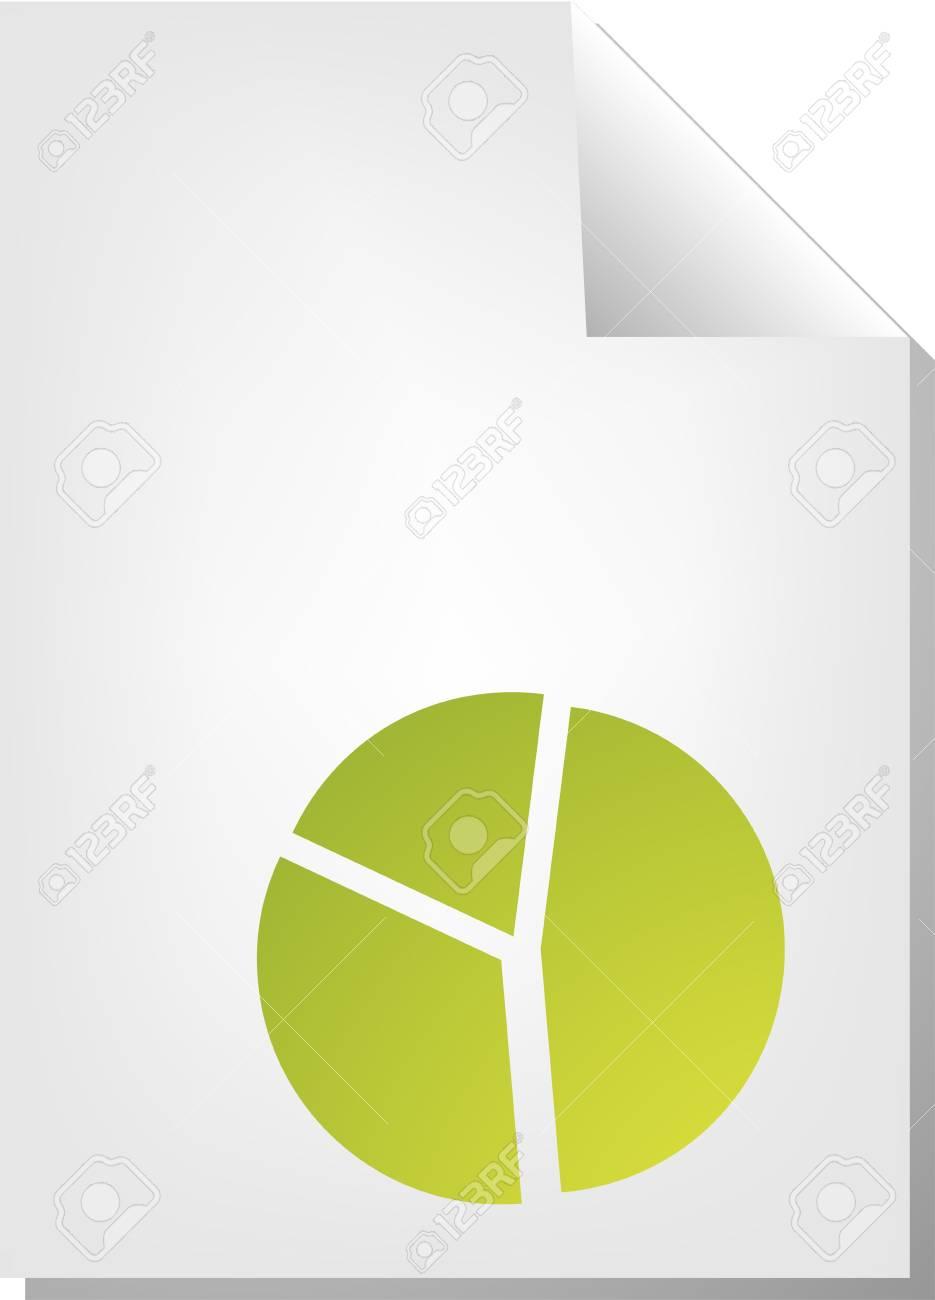 medium resolution of illustration pie chart document file type illustration clipart